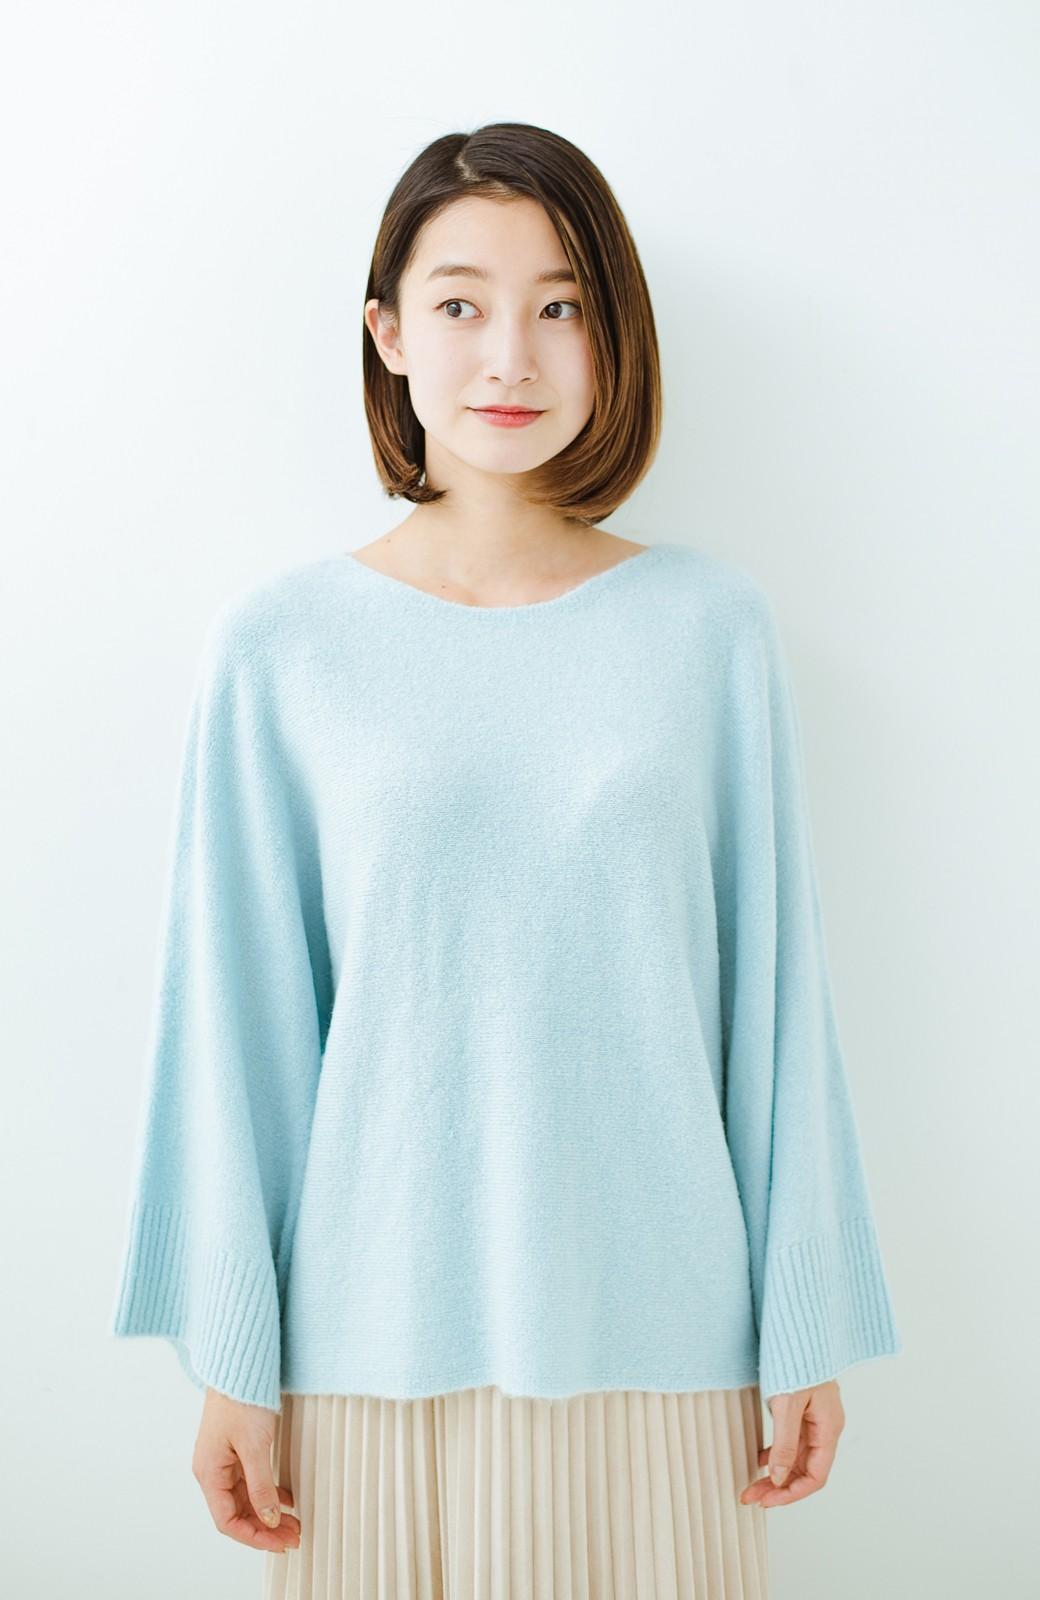 haco! 太め袖がかわいい横編みプルオーバーニット <ライトブルー>の商品写真15